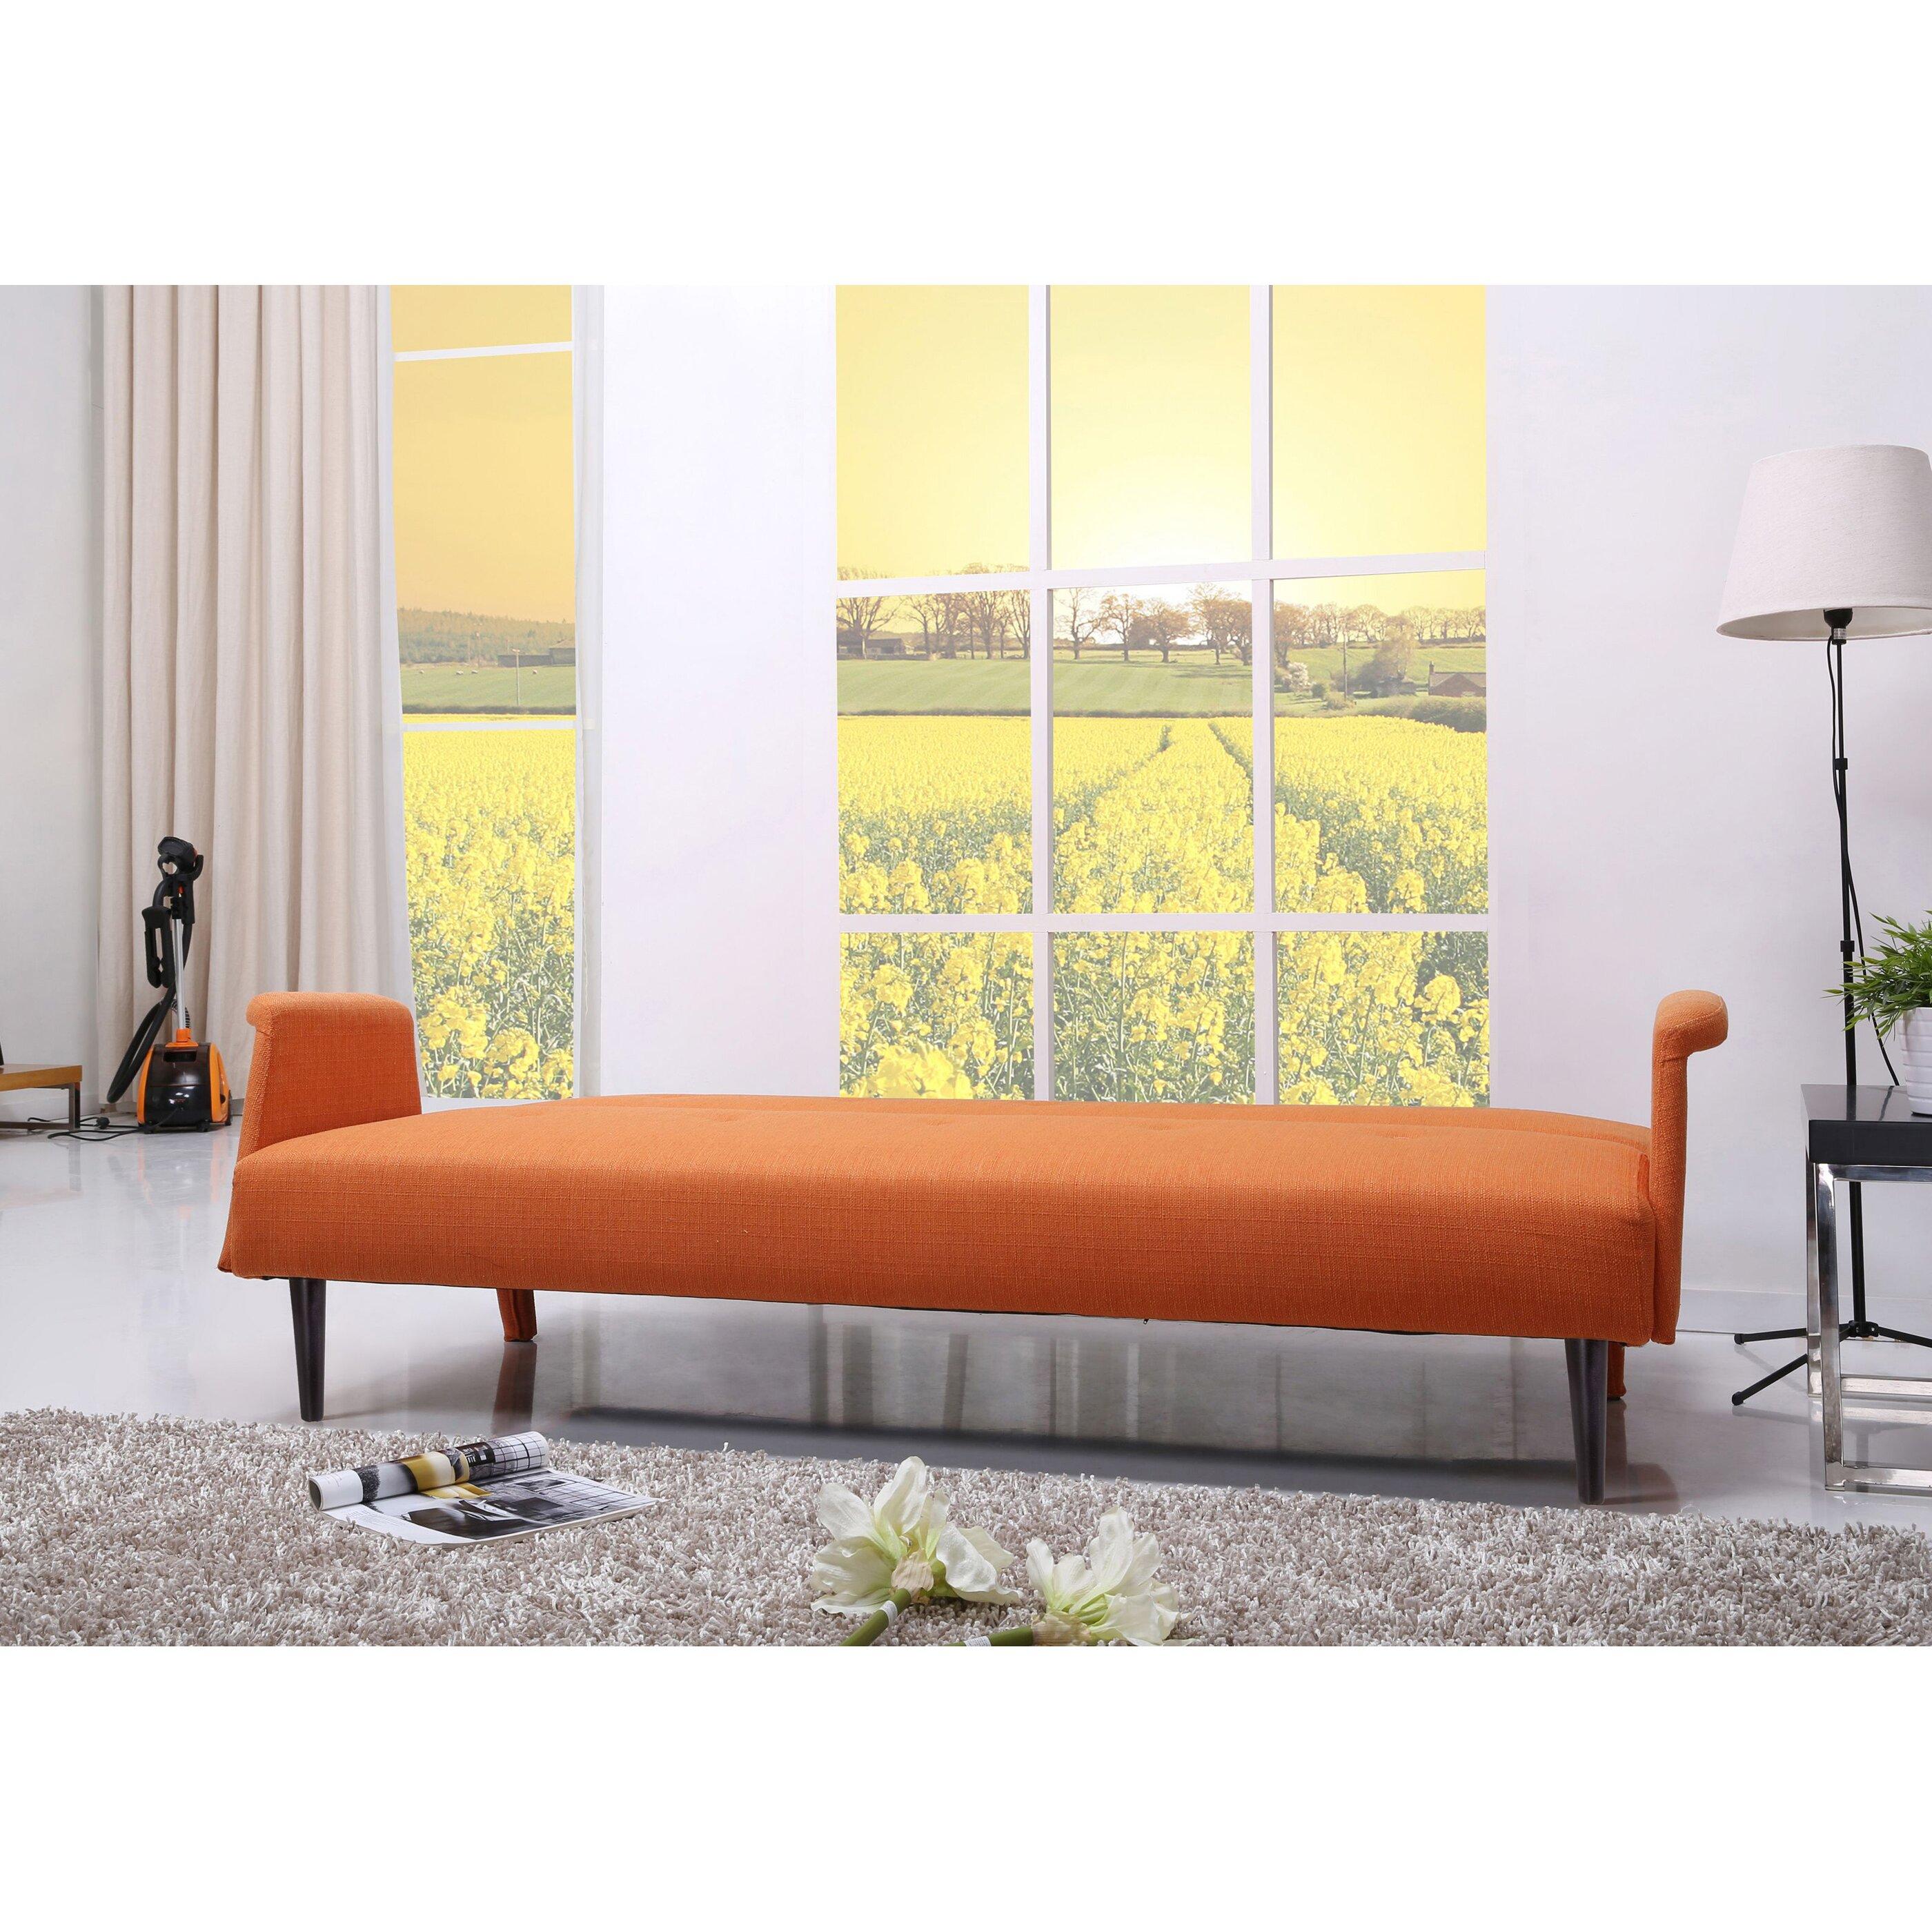 lifestyle solutions bedroom furniture green bedroom walls feng